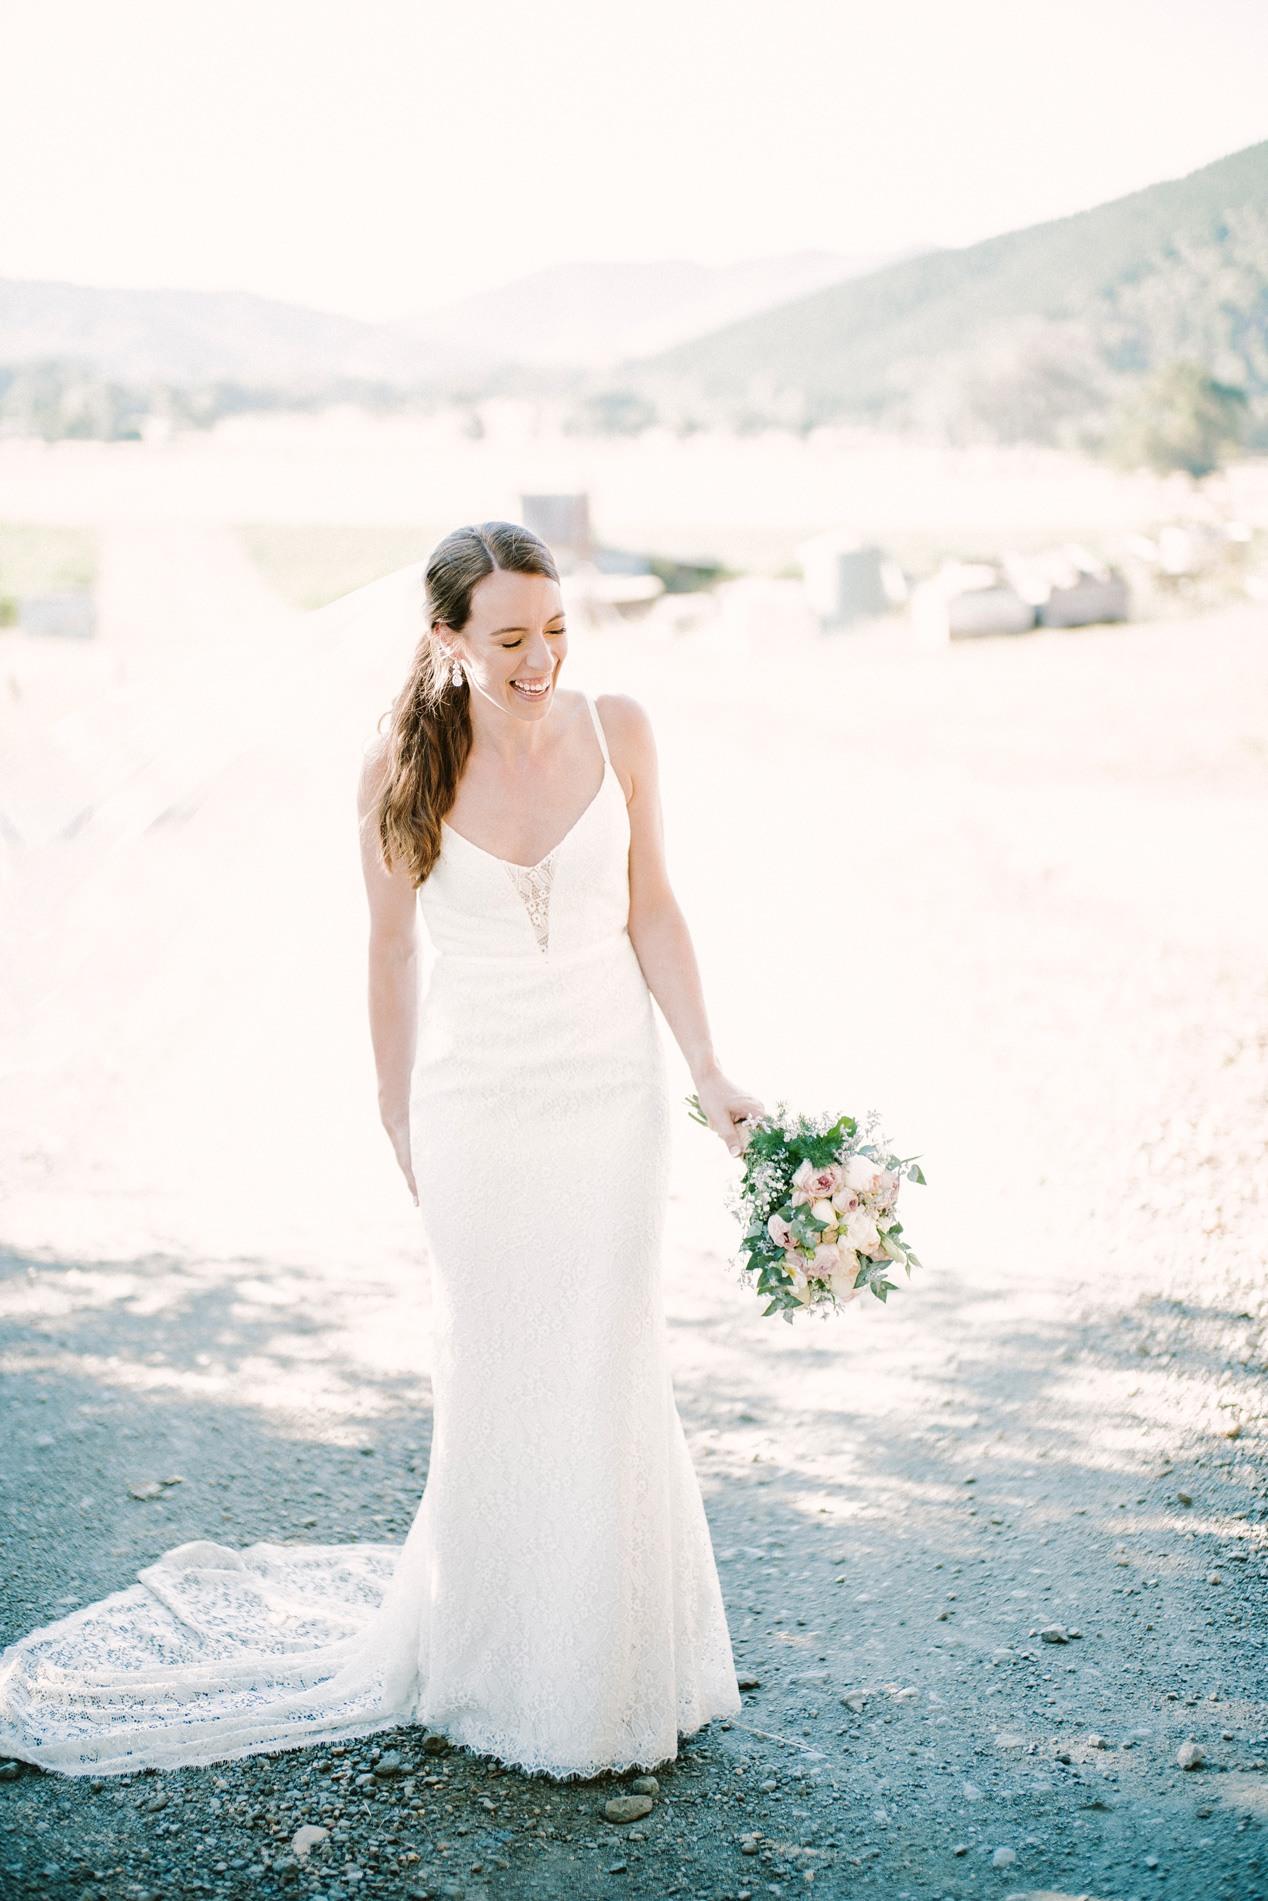 seattle-wedding-photographer-kyle-larson420